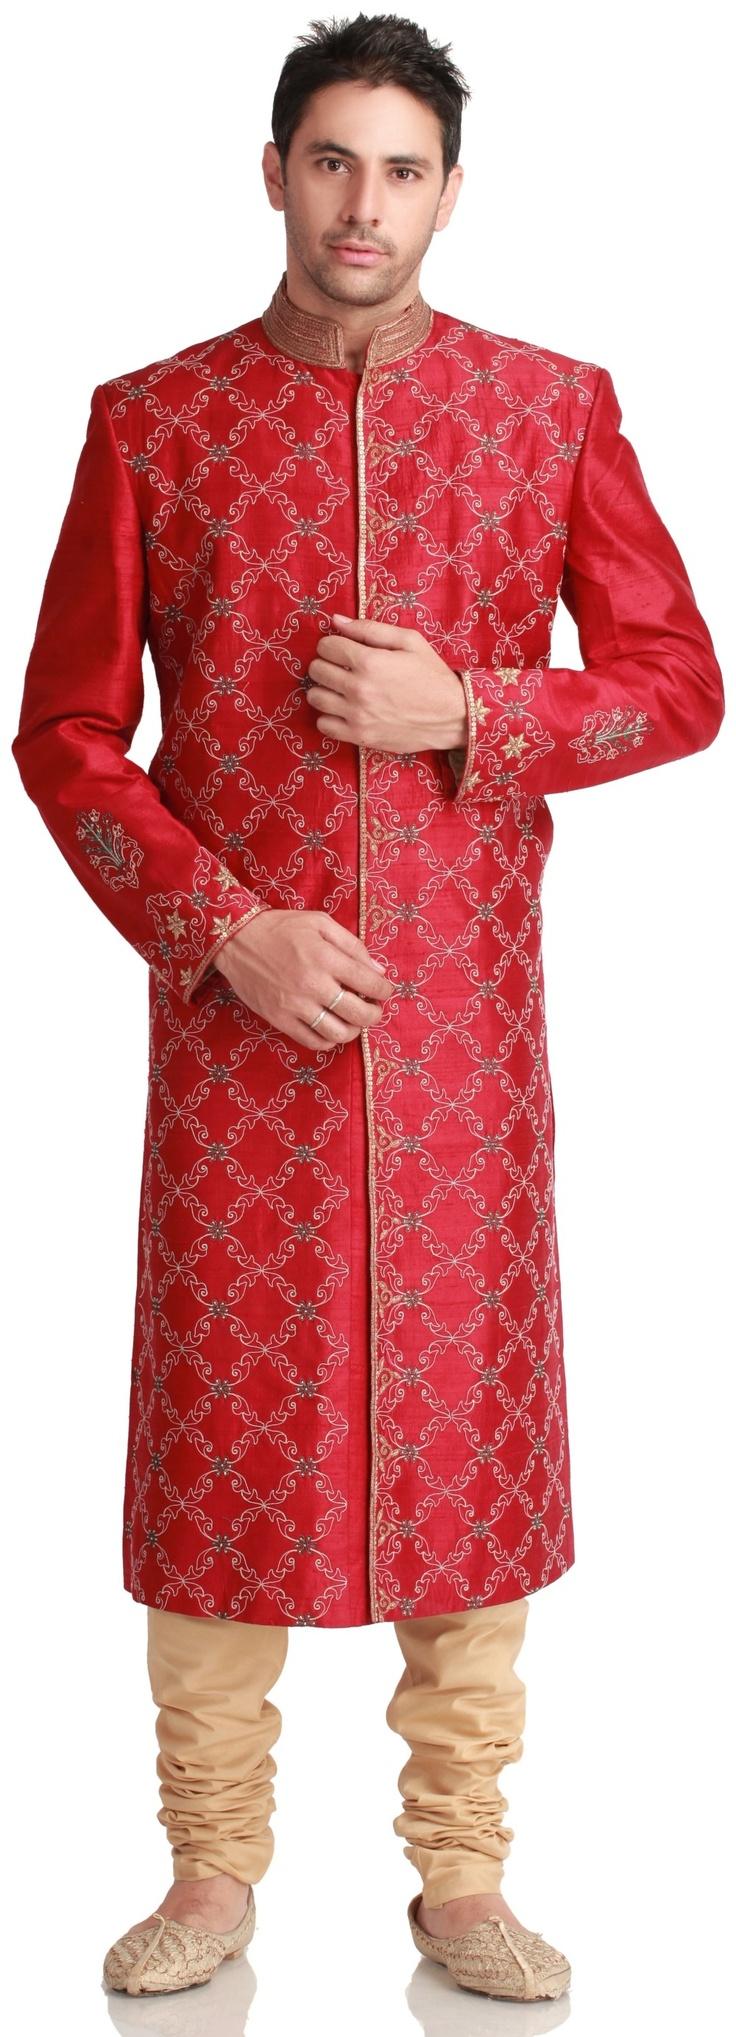 98 best indian groom wear images on pinterest wedding for Indian wedding dresses mens